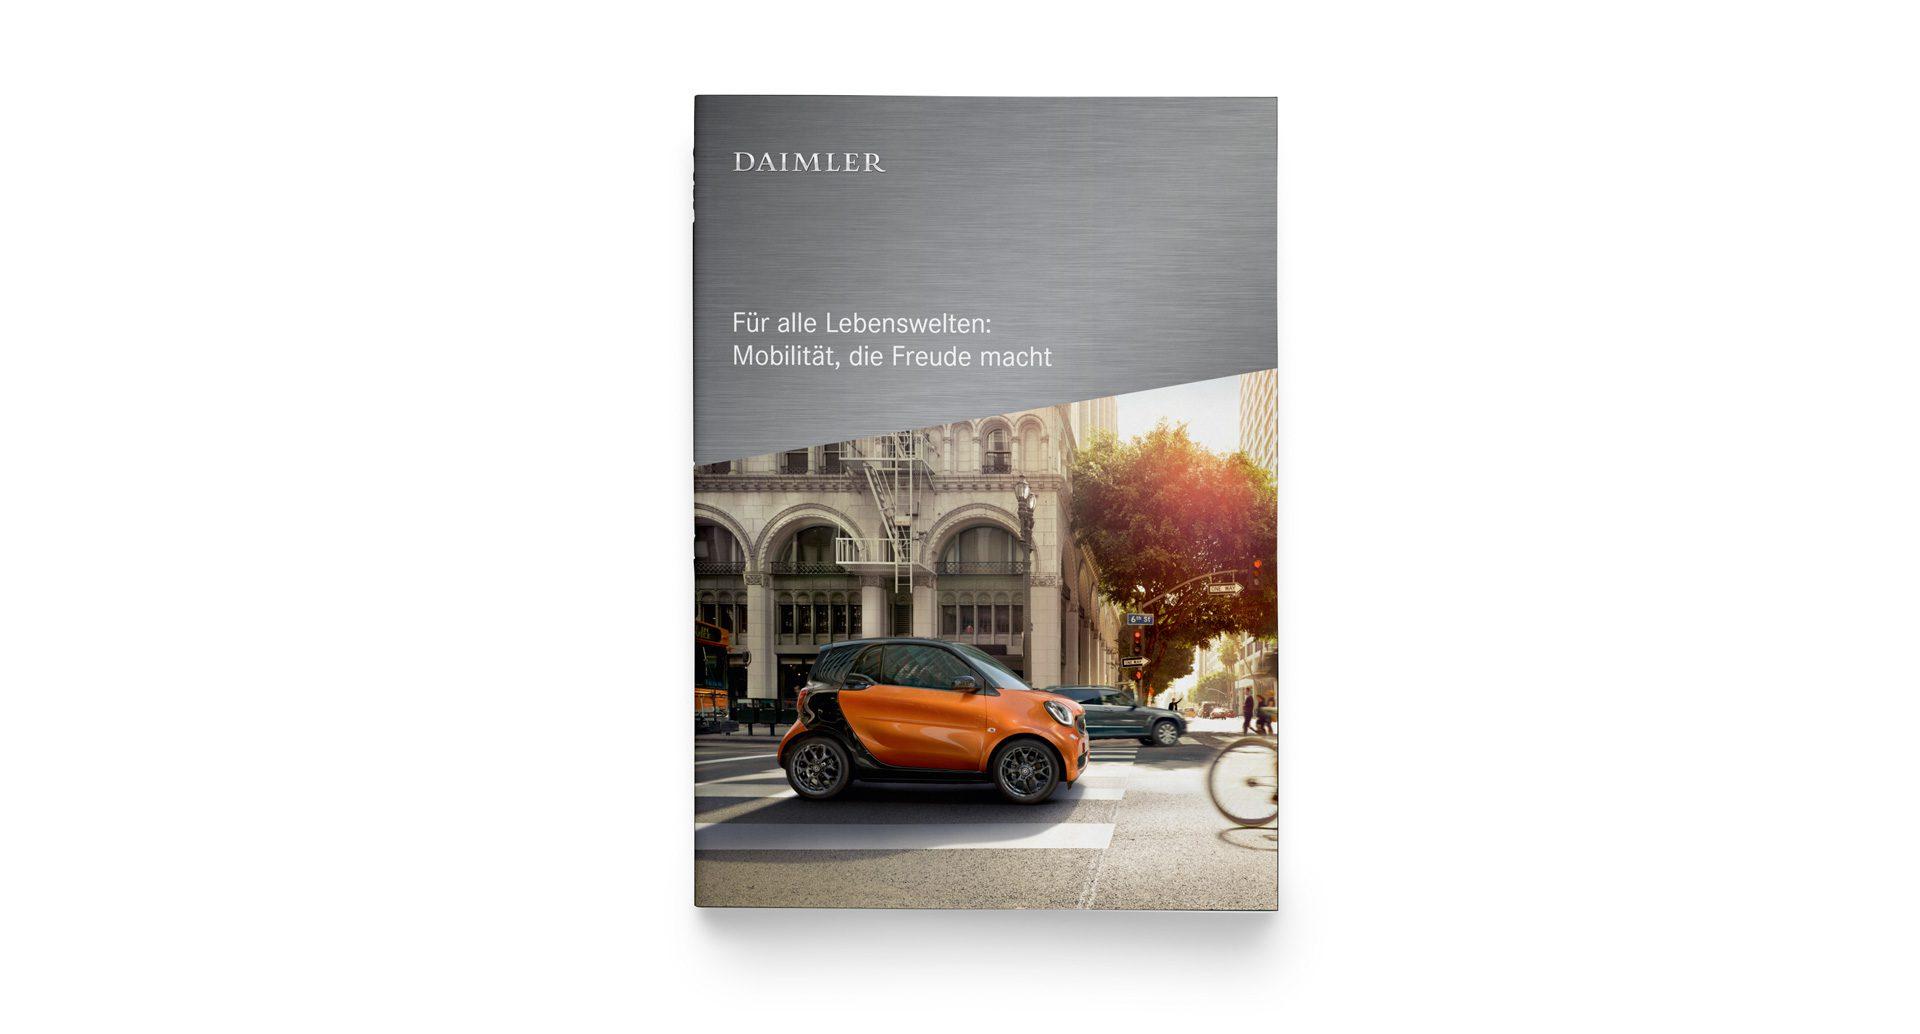 Daimler Corporate Design Cover